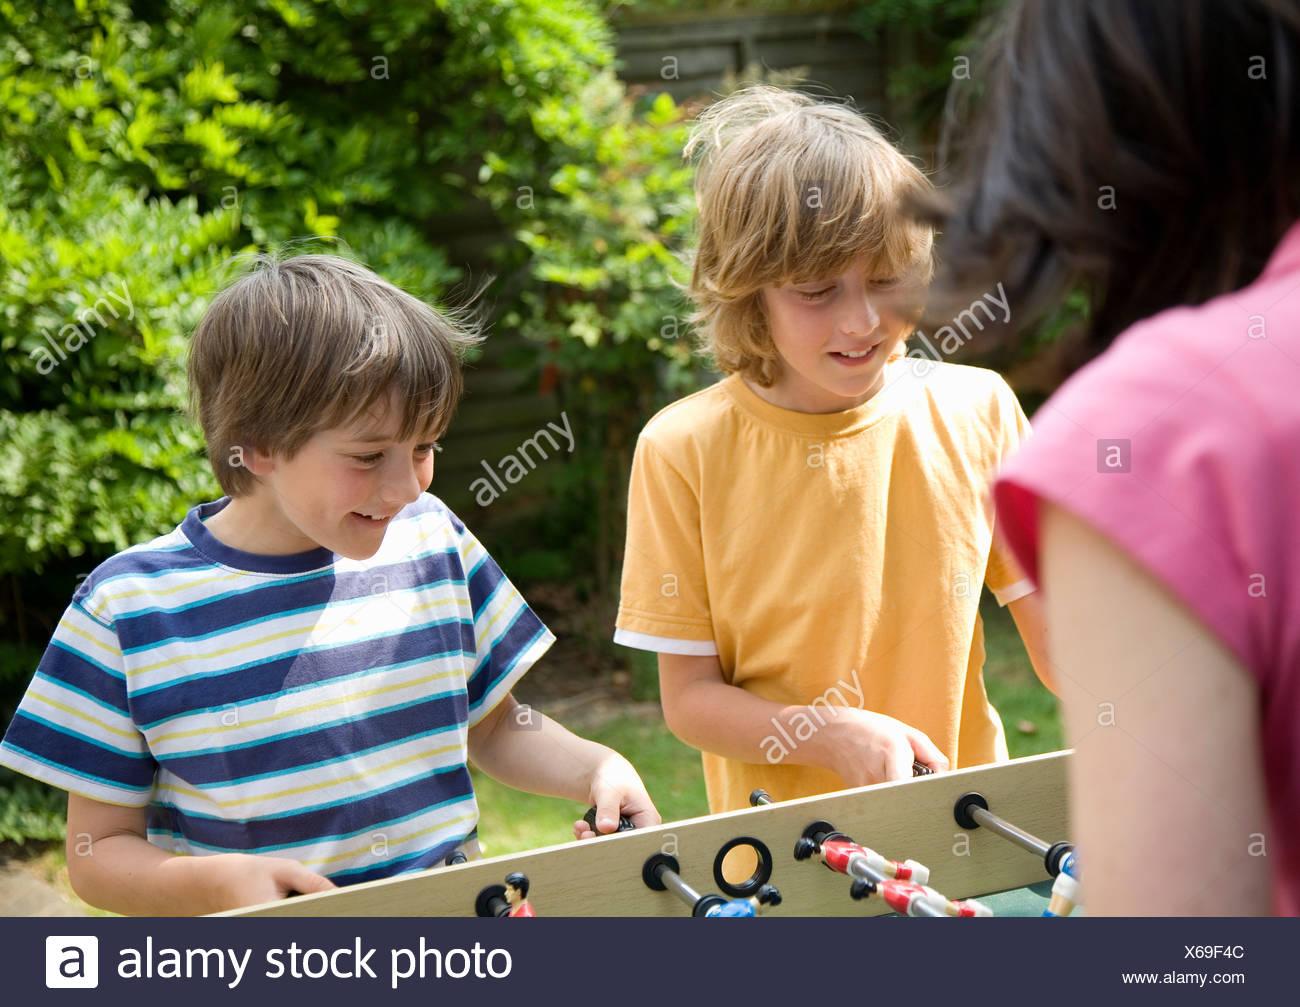 Two boys playing table football - Stock Image